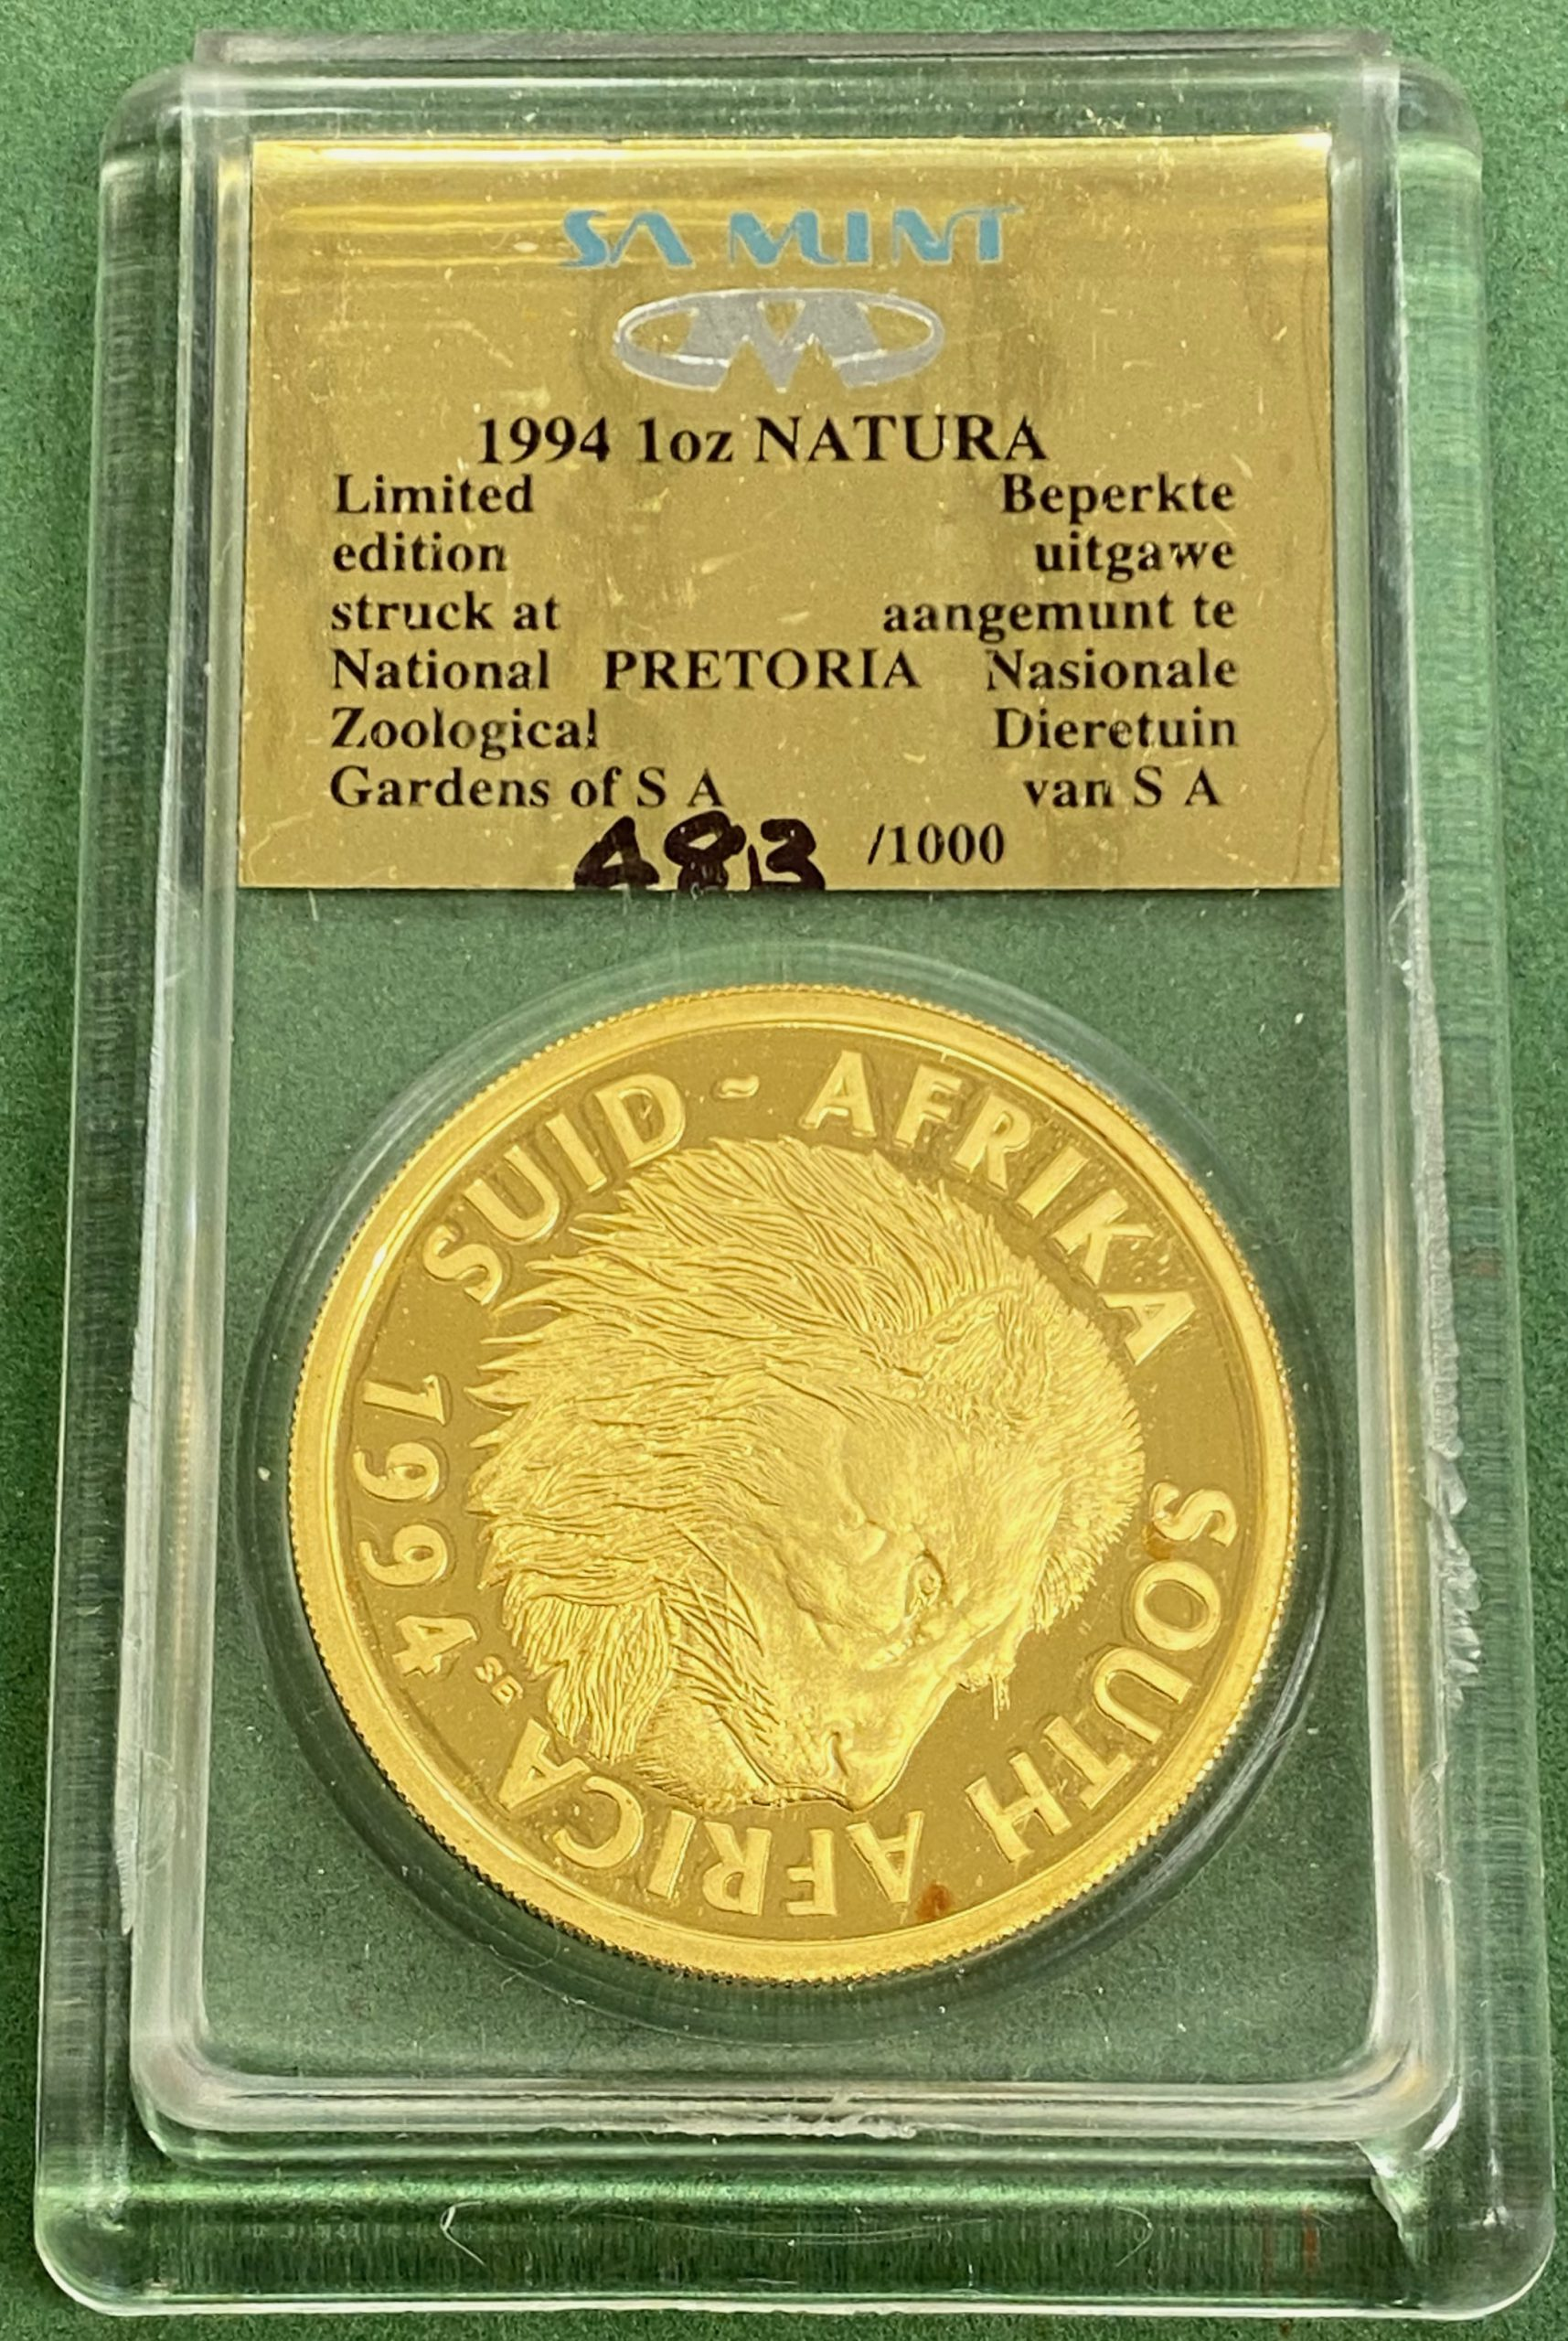 1994 Sør Afrika Natura Coin Monarchs of Africa, 1 oz gull, proof